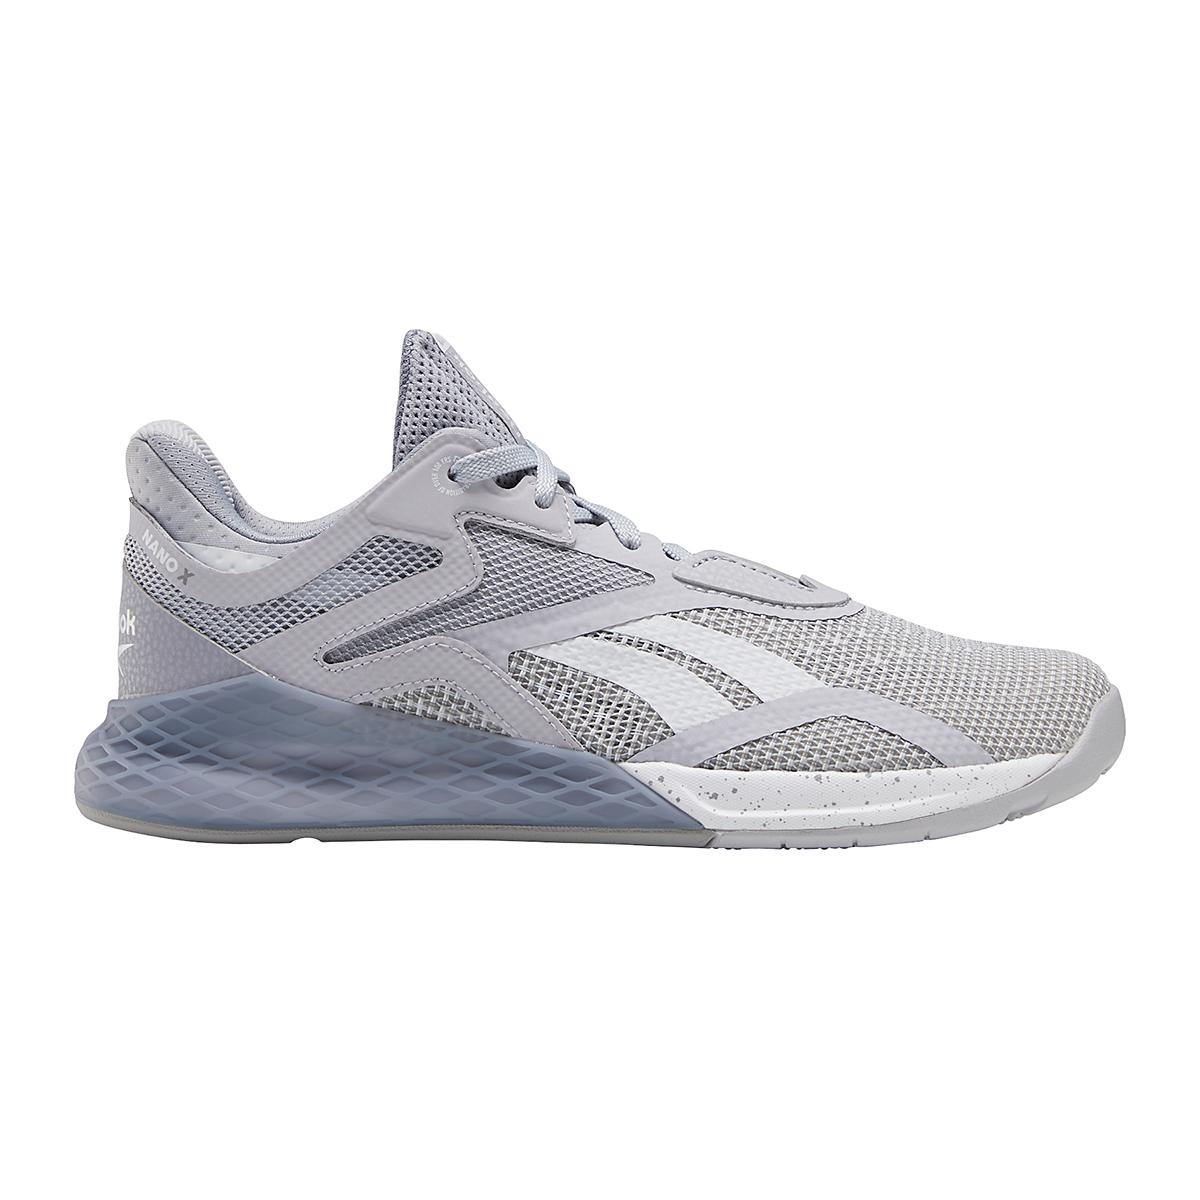 Women's Reebok Nano X Training Shoe - Color: Cold Grey/Cool Shadow/White - Size: 5 - Width: Regular, Cold Grey/Cool Shadow/White, large, image 1